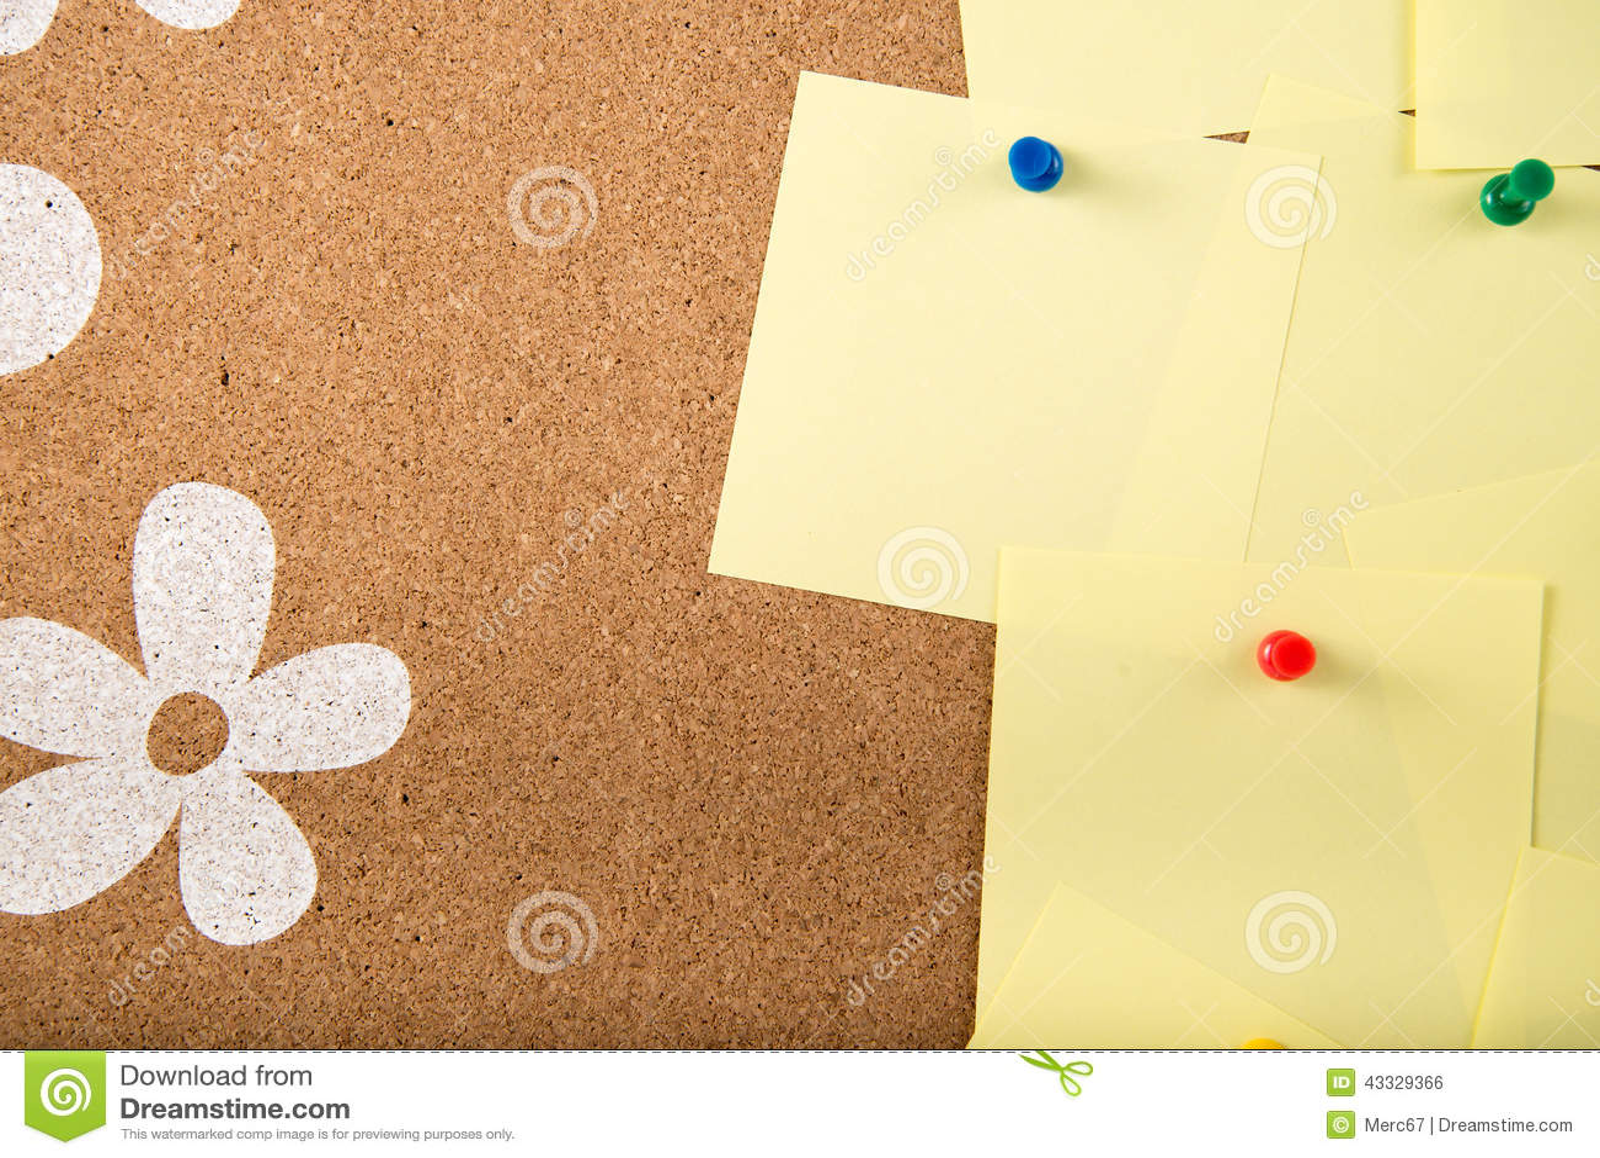 Sticky note memo card on board